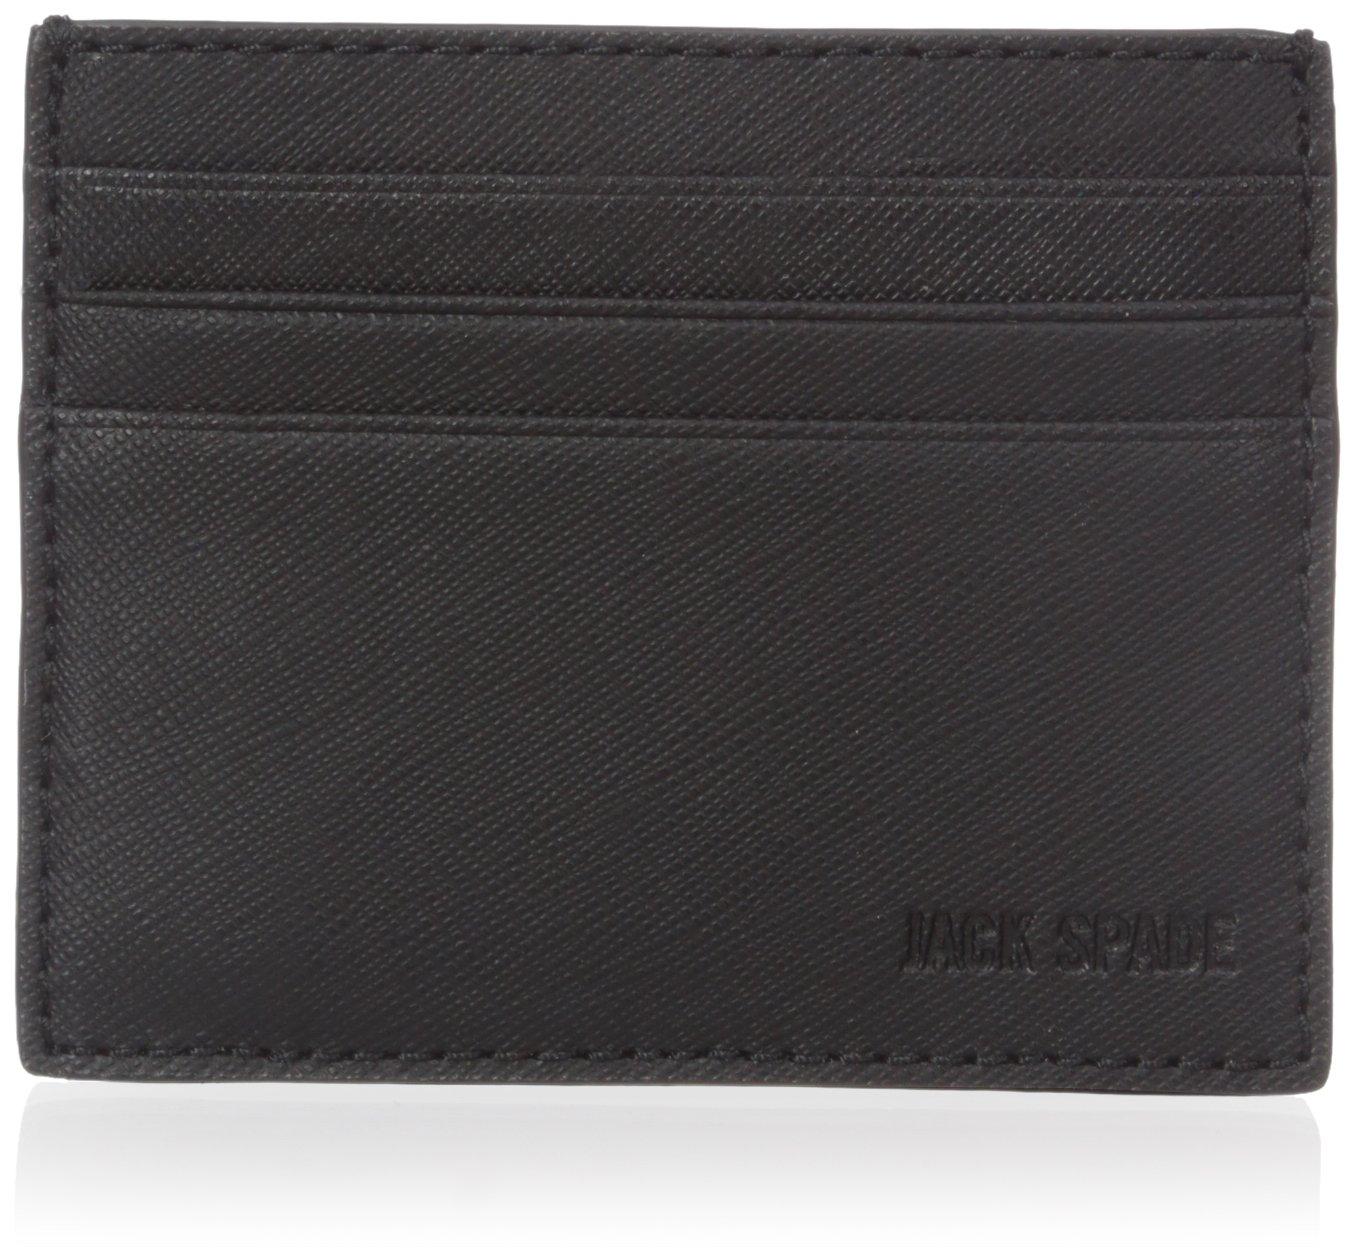 Jack Spade Men's Barrow Leather 6 Card Holder, black, One Size